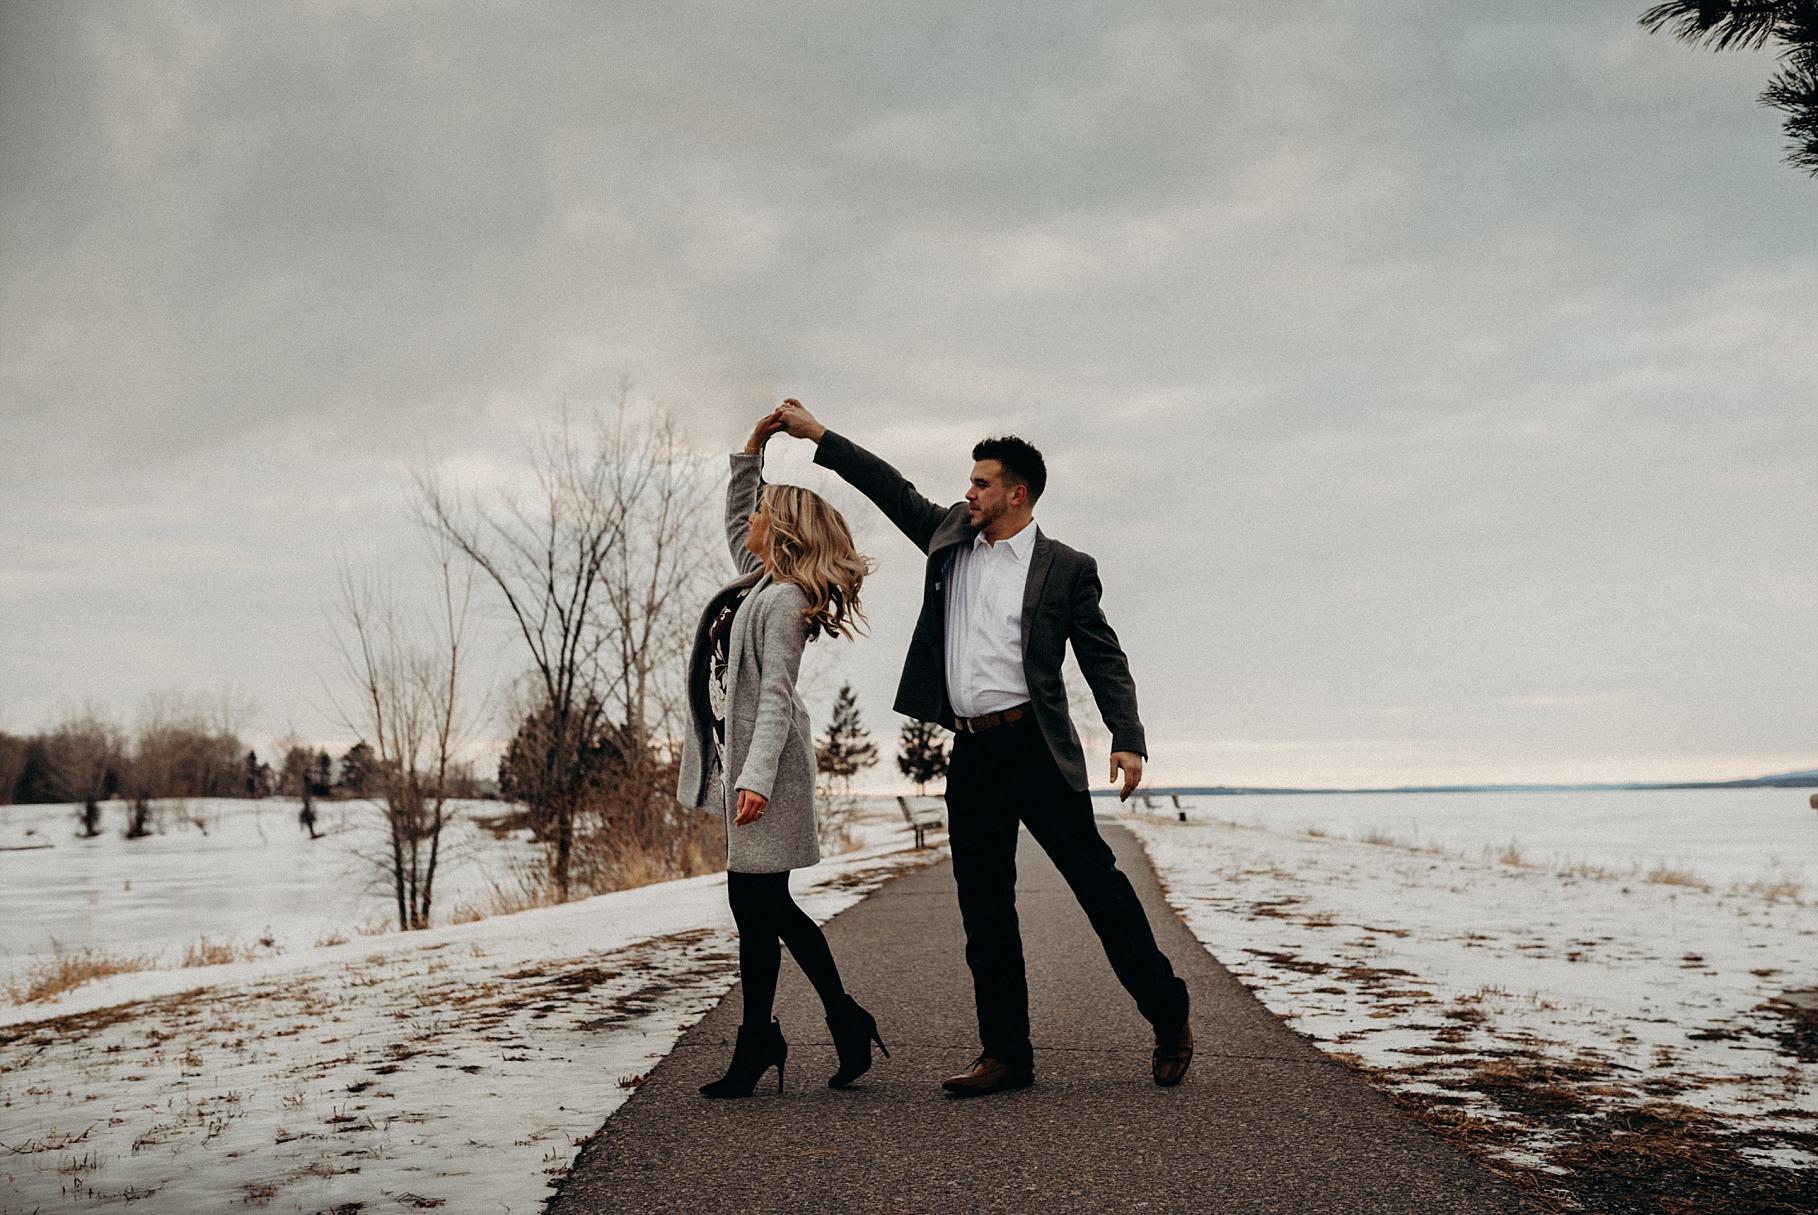 Mocha Tree Studios Ottawa Toronto Montreal Wedding and Engagement Photographer and Videographer Dark Moody Intimate Authentic Modern Romantic Cinematic Best Candid Nepean Sailing Club Andew Haydon Park 2